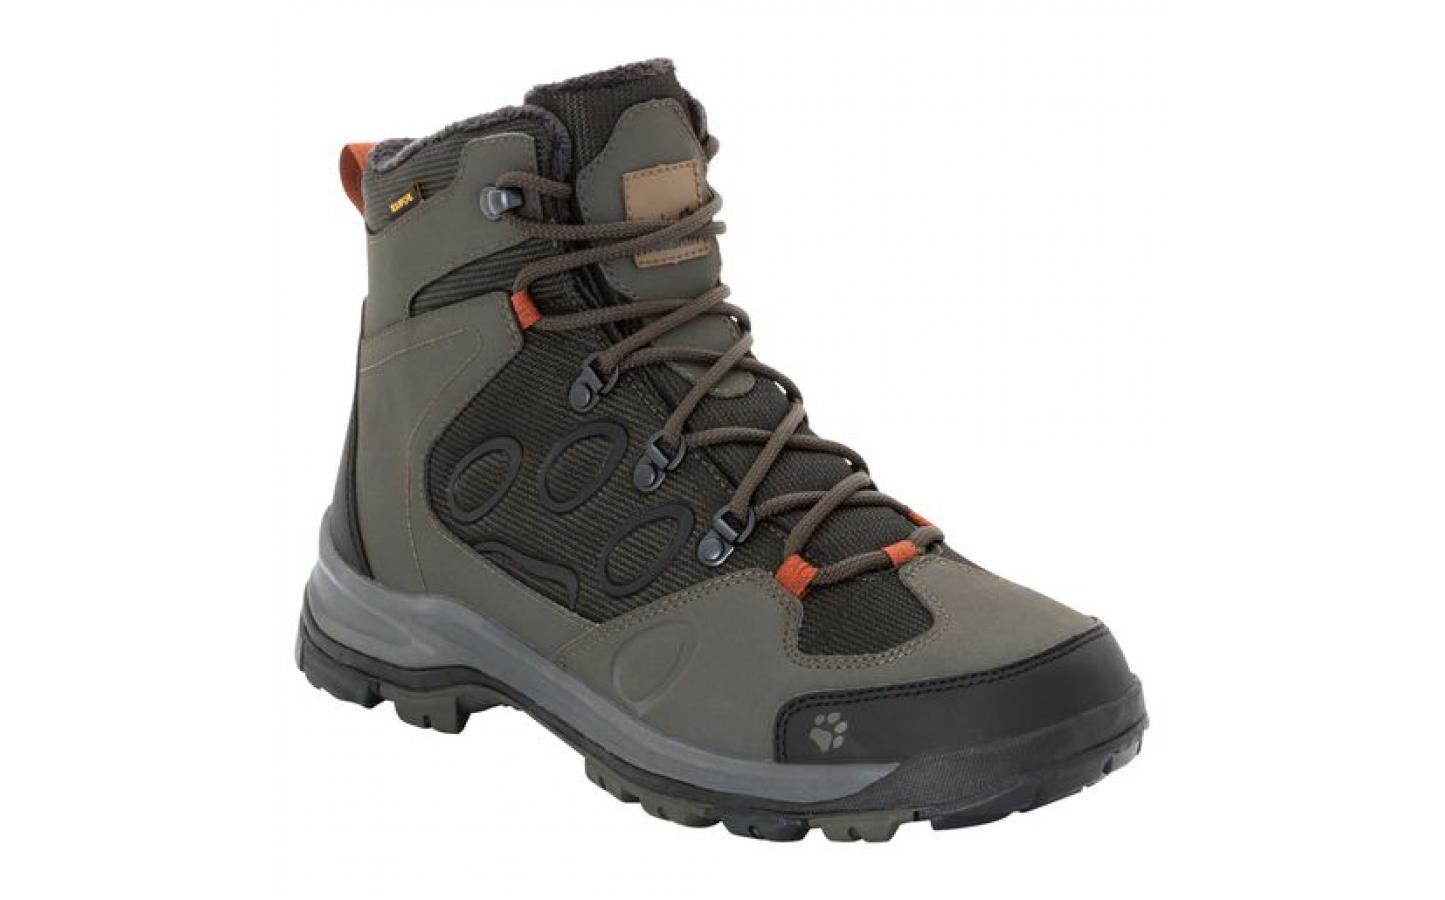 5ad40118175 Ботинки Jack Wolfskin Cold Terrain Texapore Mid M купить по цене в 6 ...